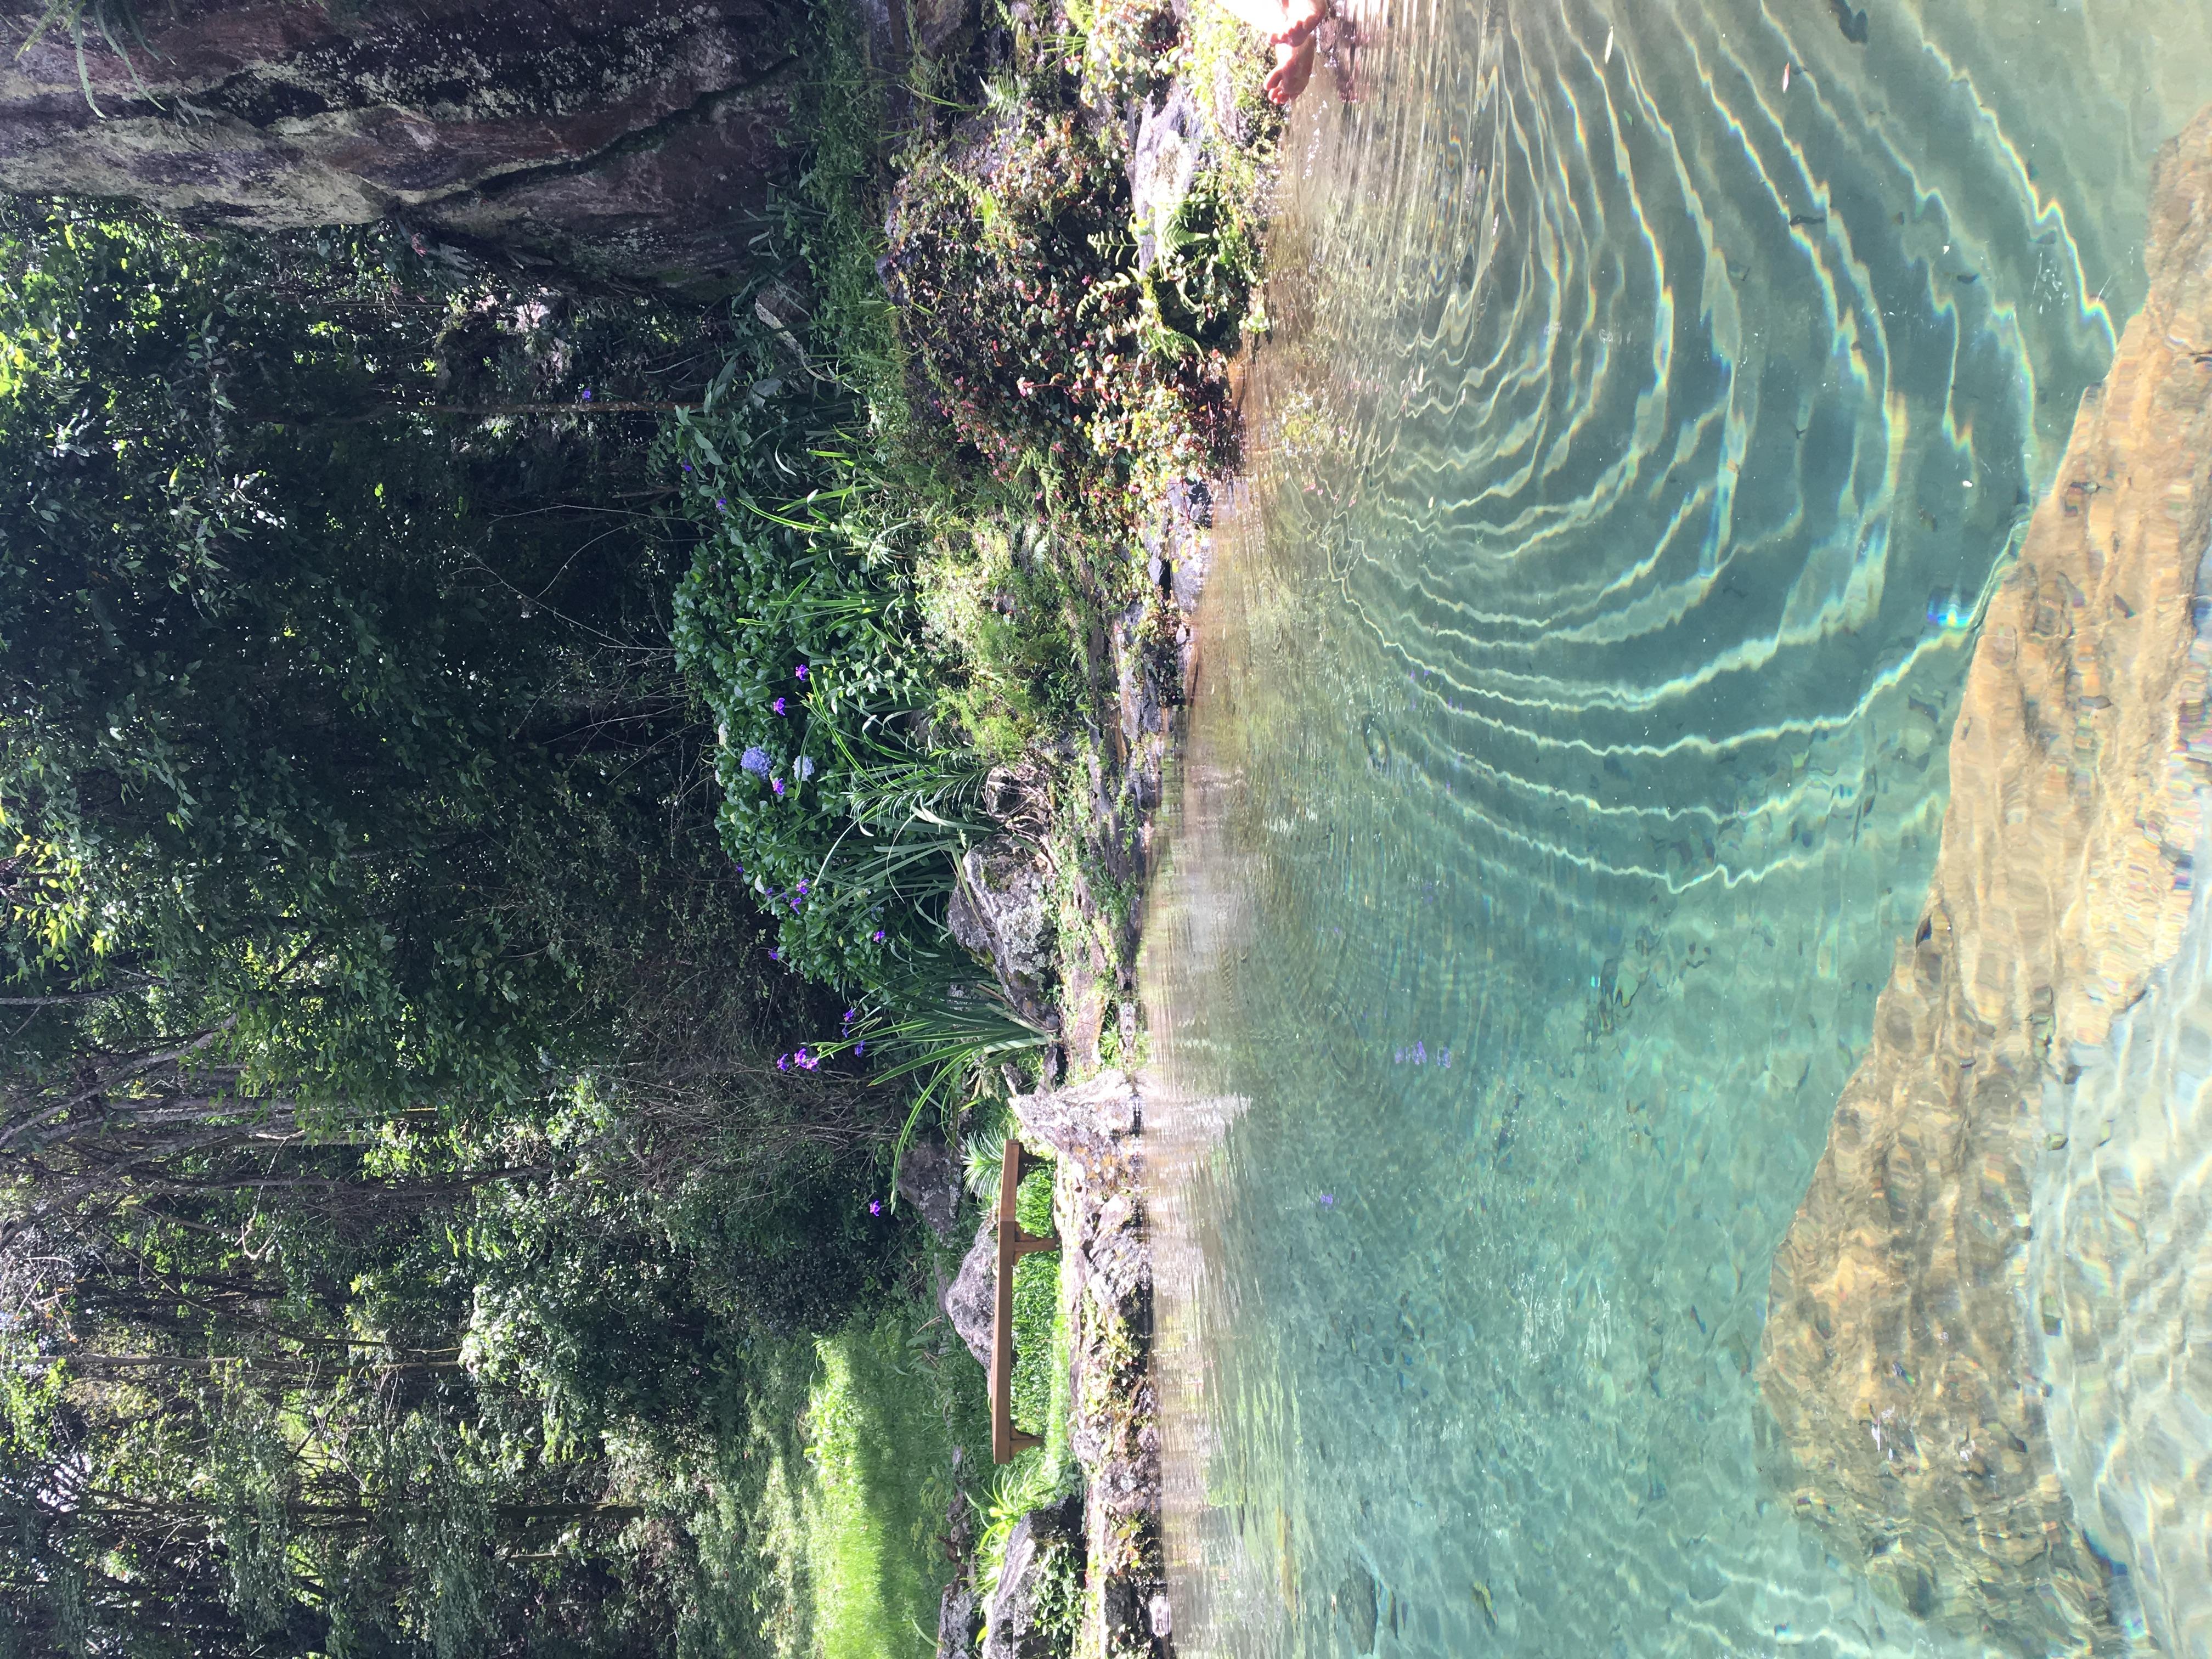 sim 13 agua e ondas piscina natural